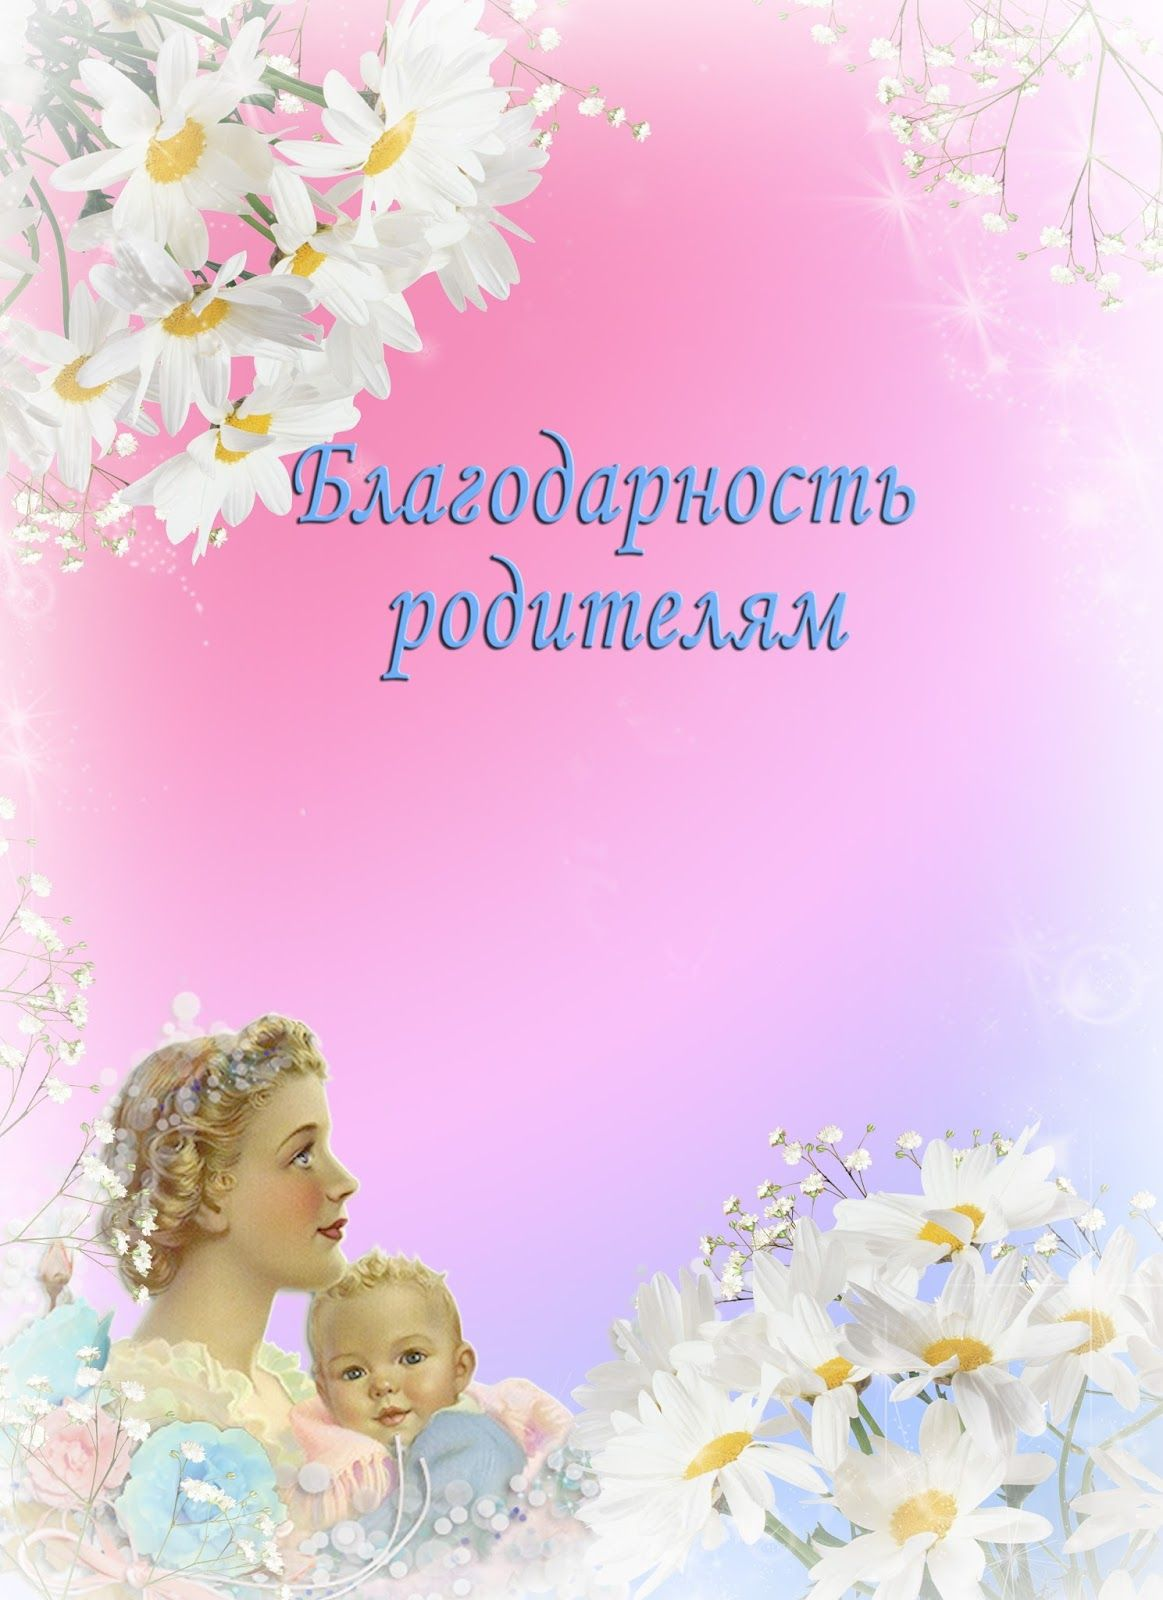 Благодарность родителям шаблон 5 фото